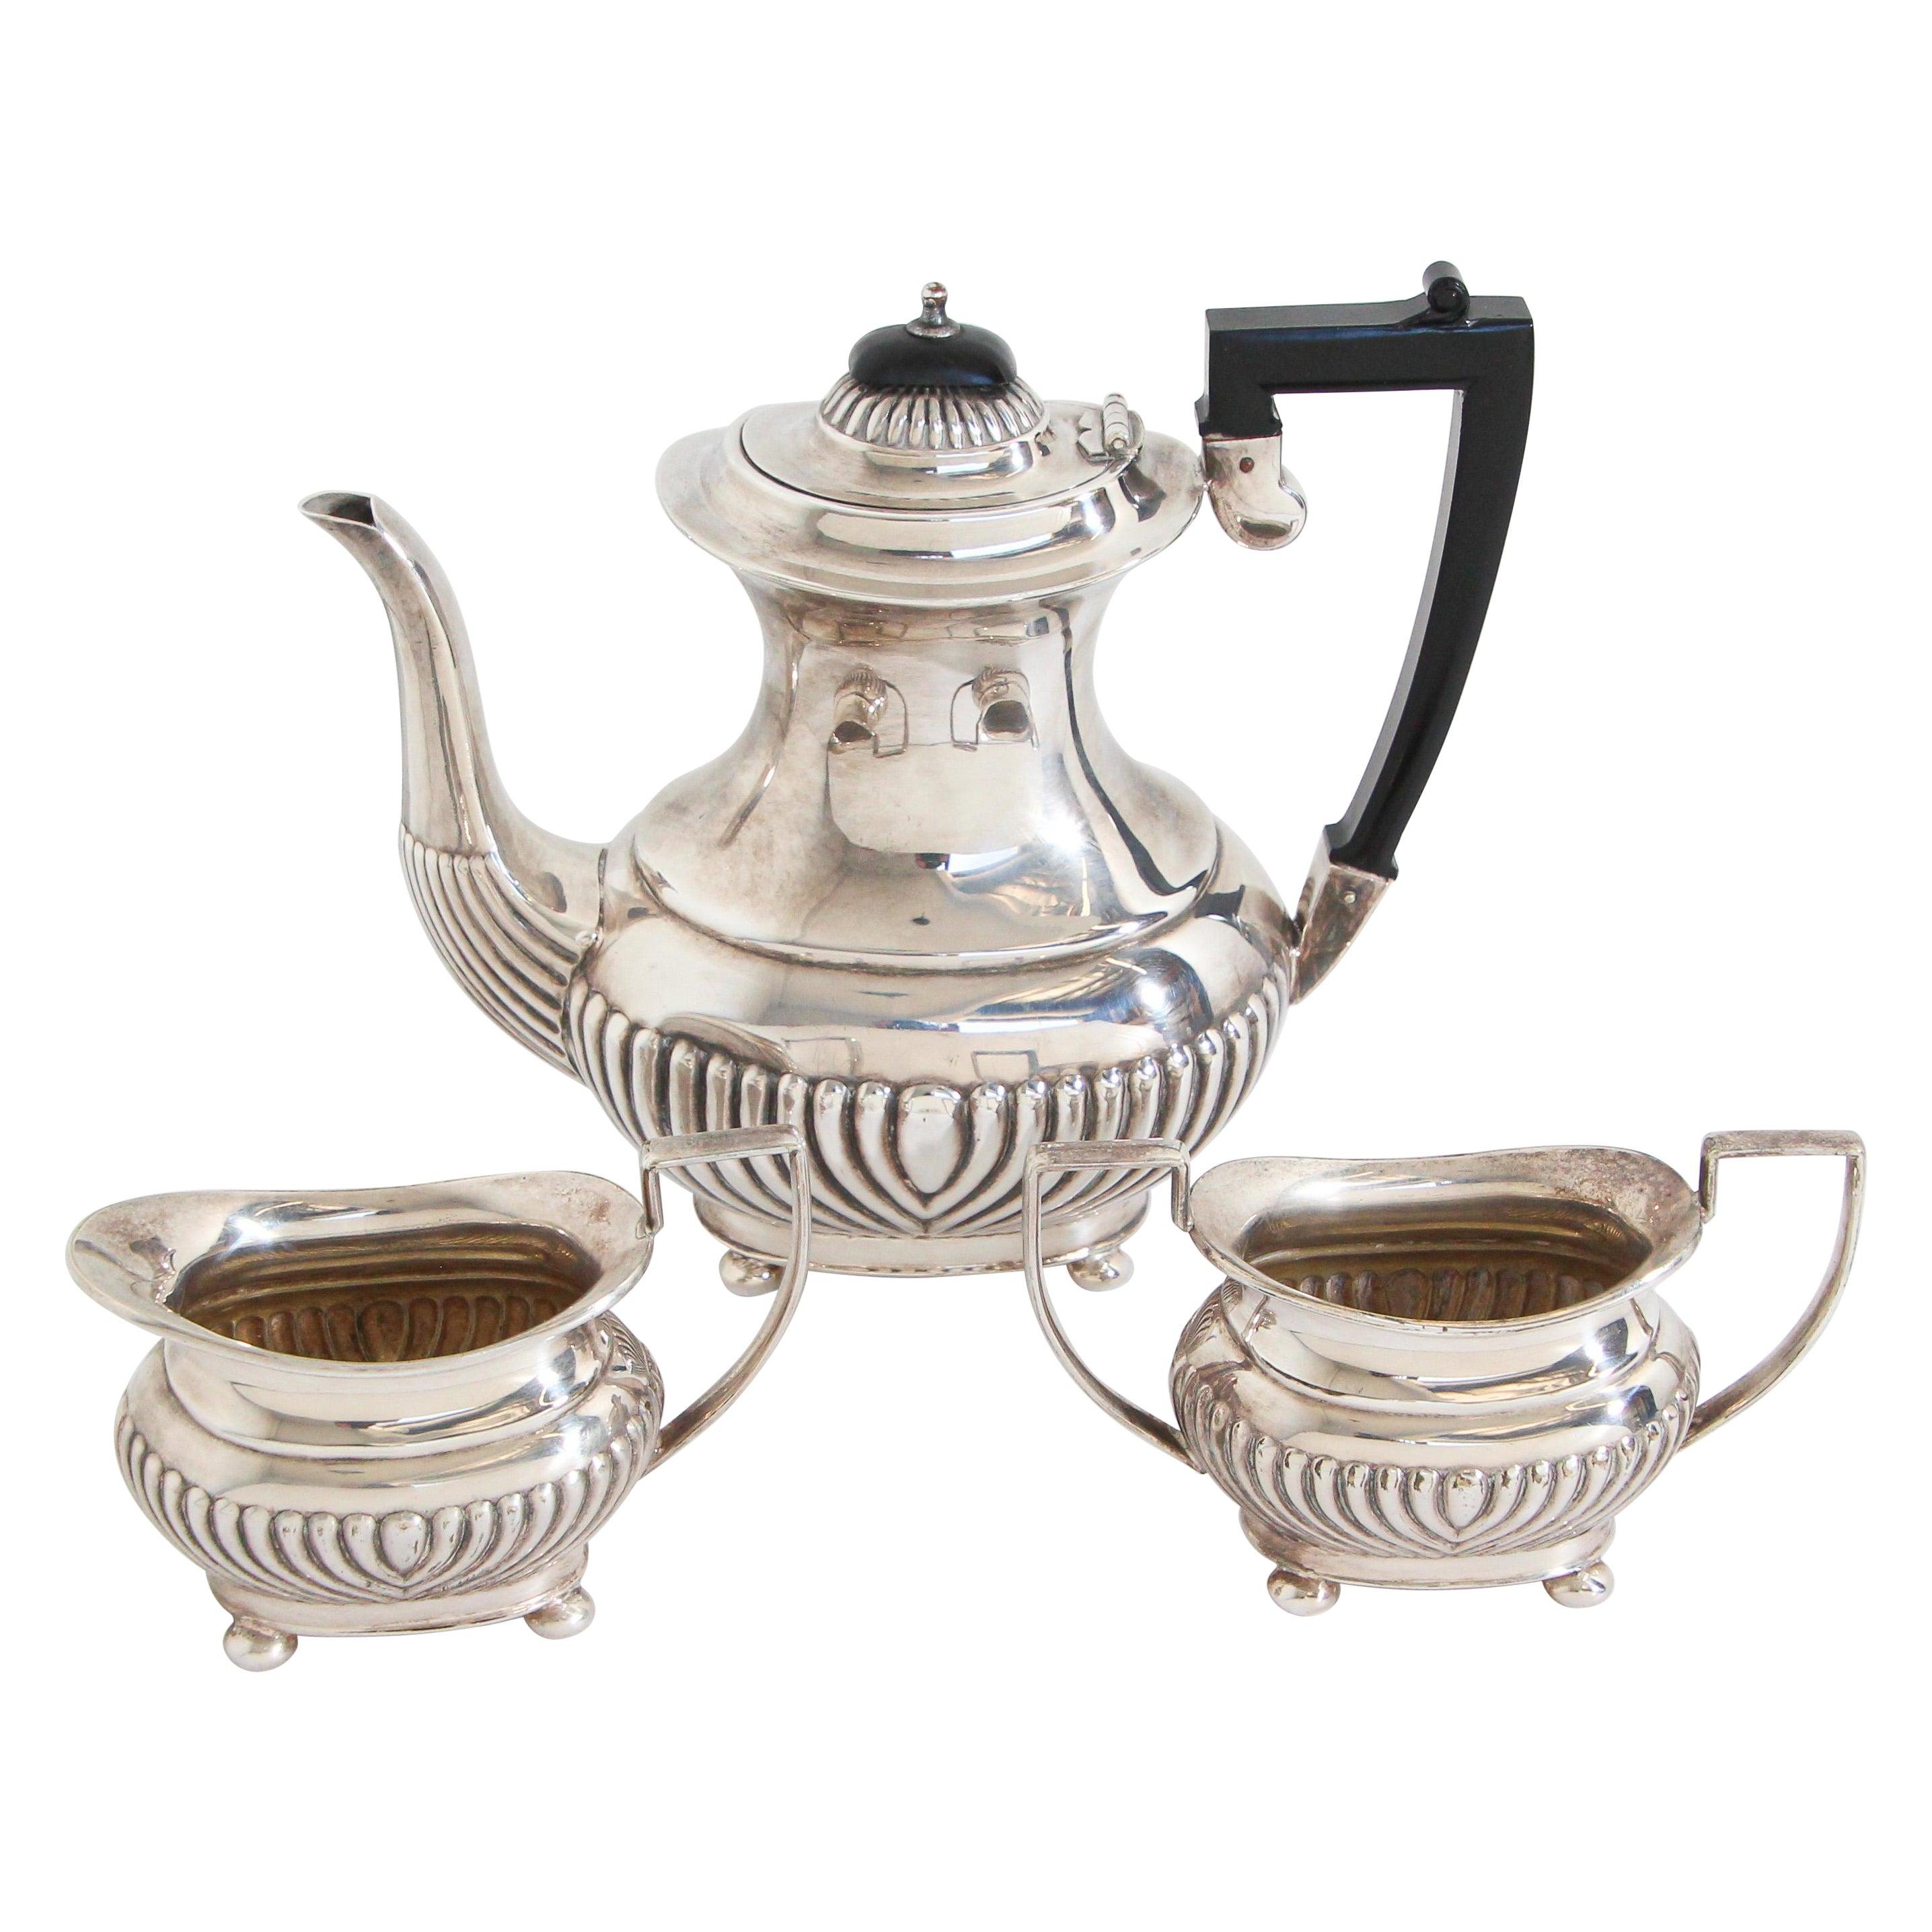 Antique Sheffield Silverplate Tea Set